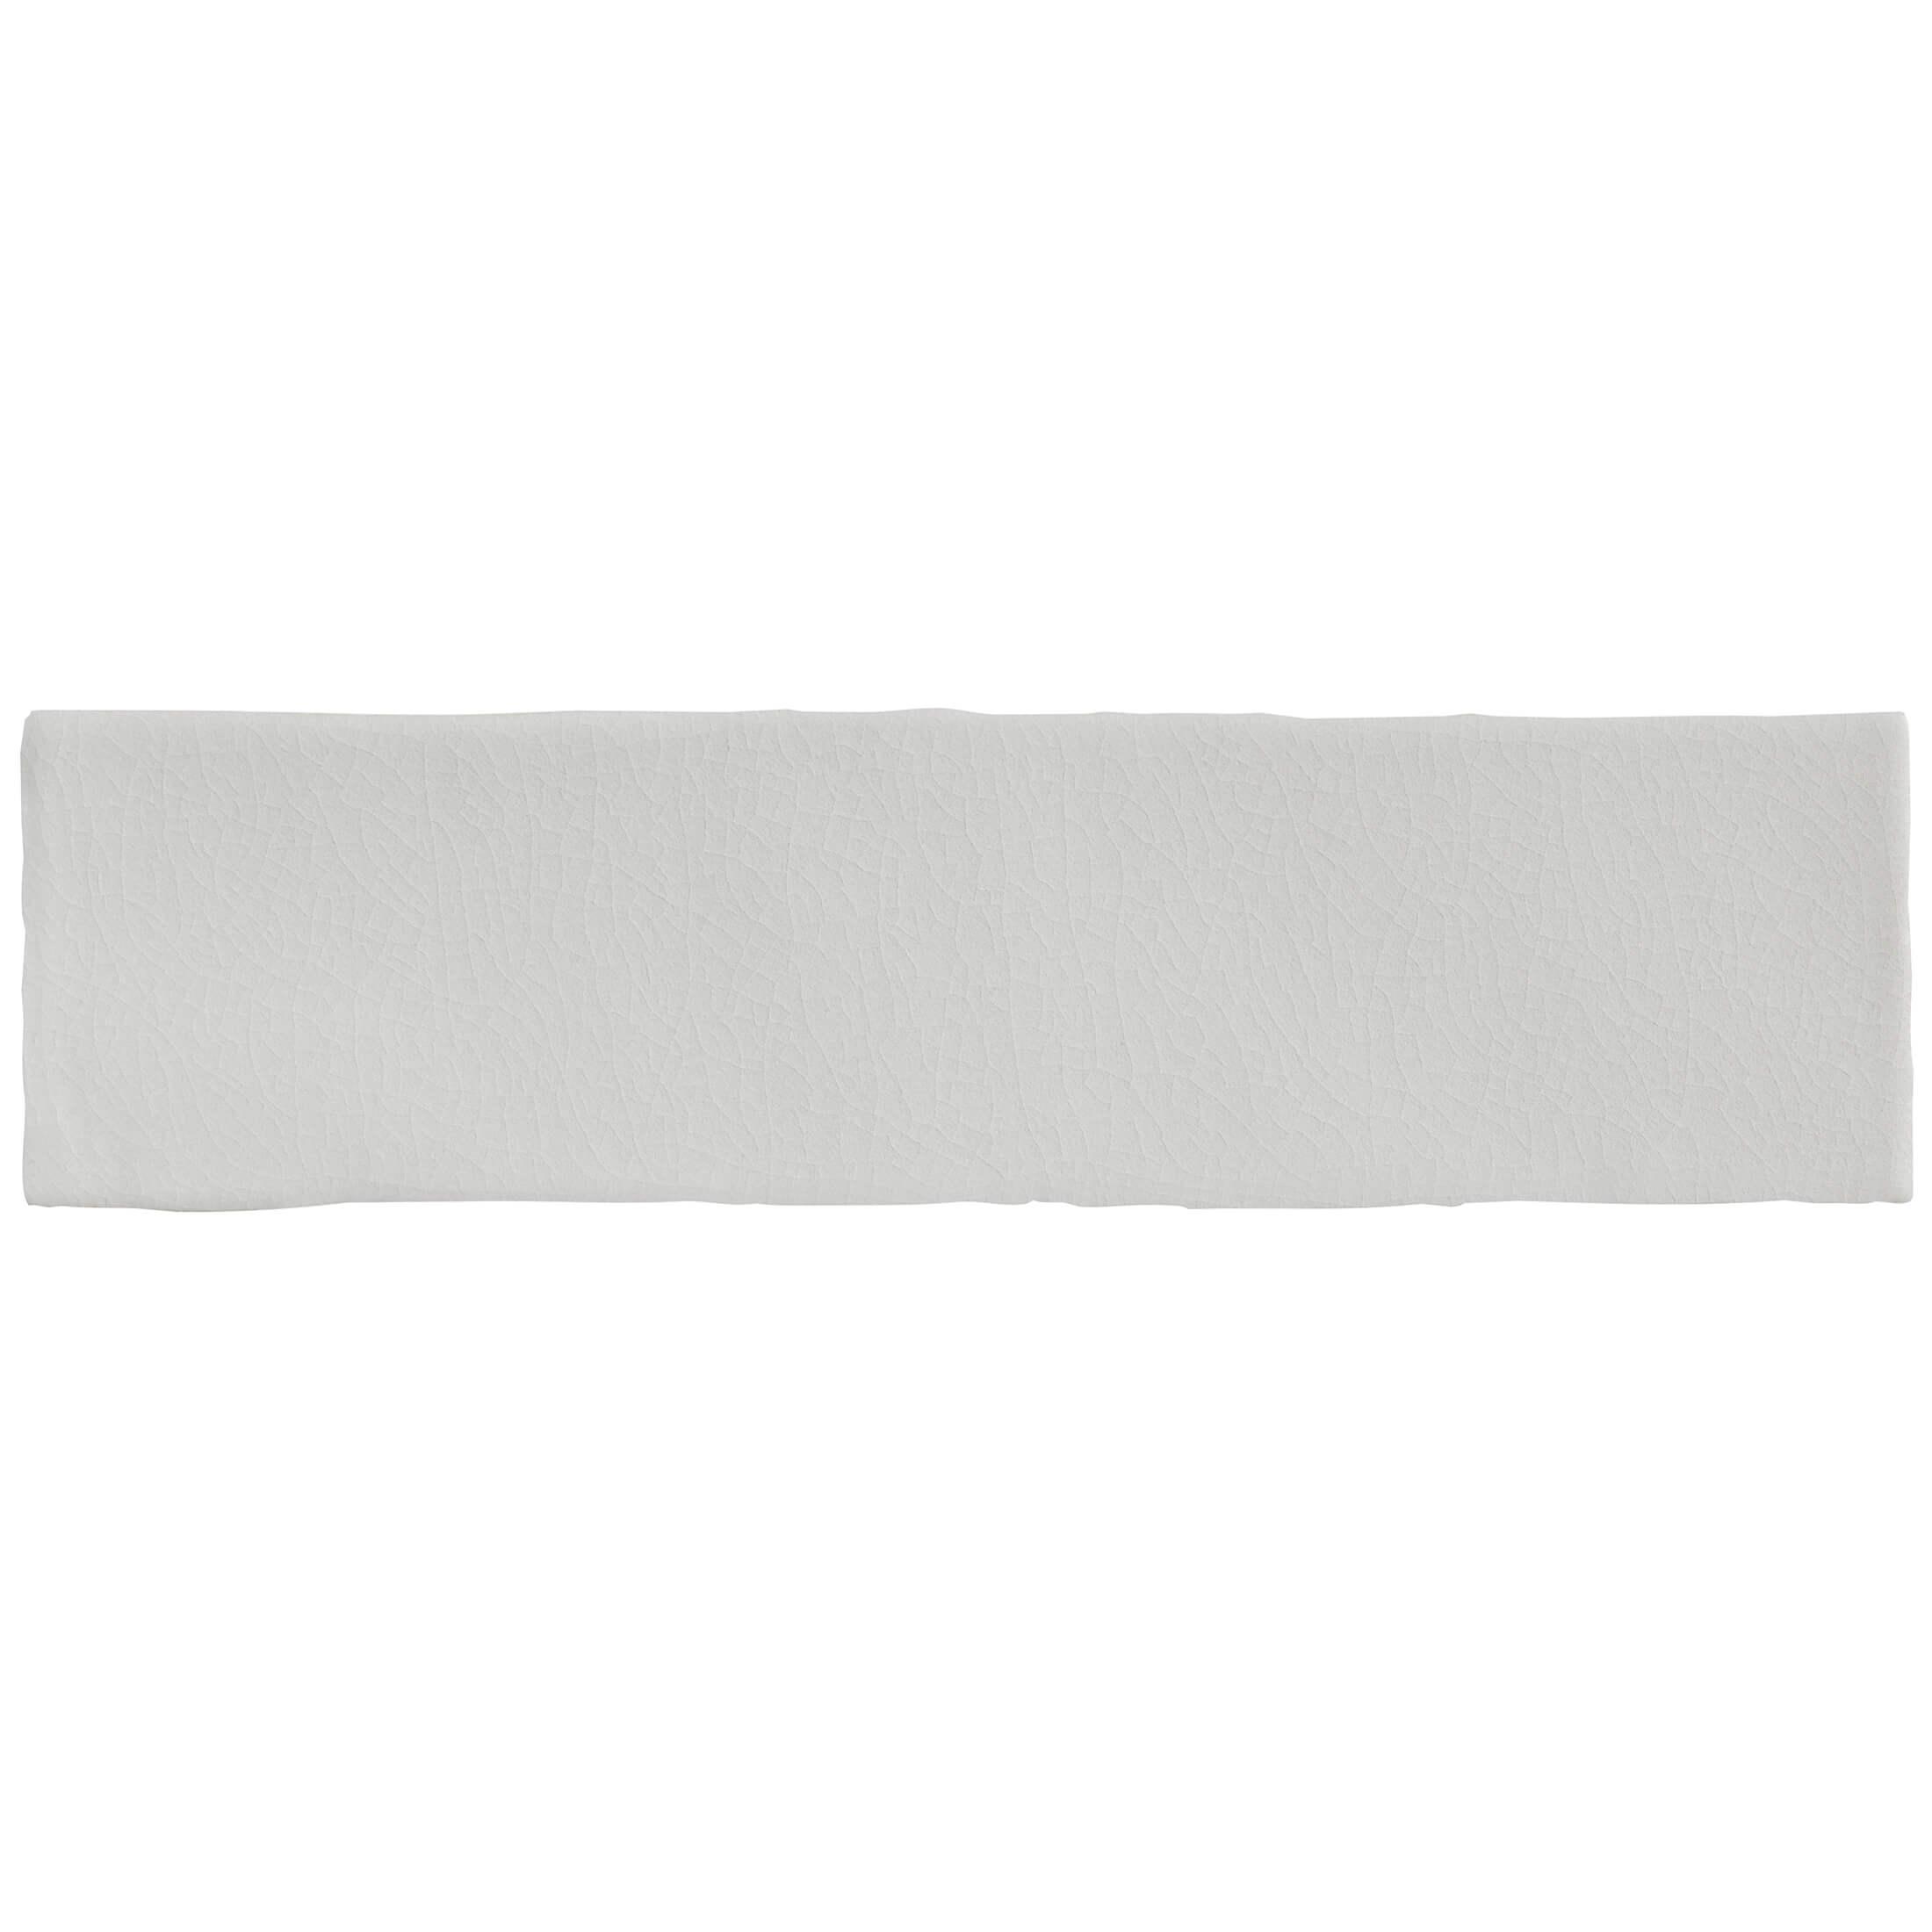 ADEH1020 - LISO  - 7.5 cm X 30 cm